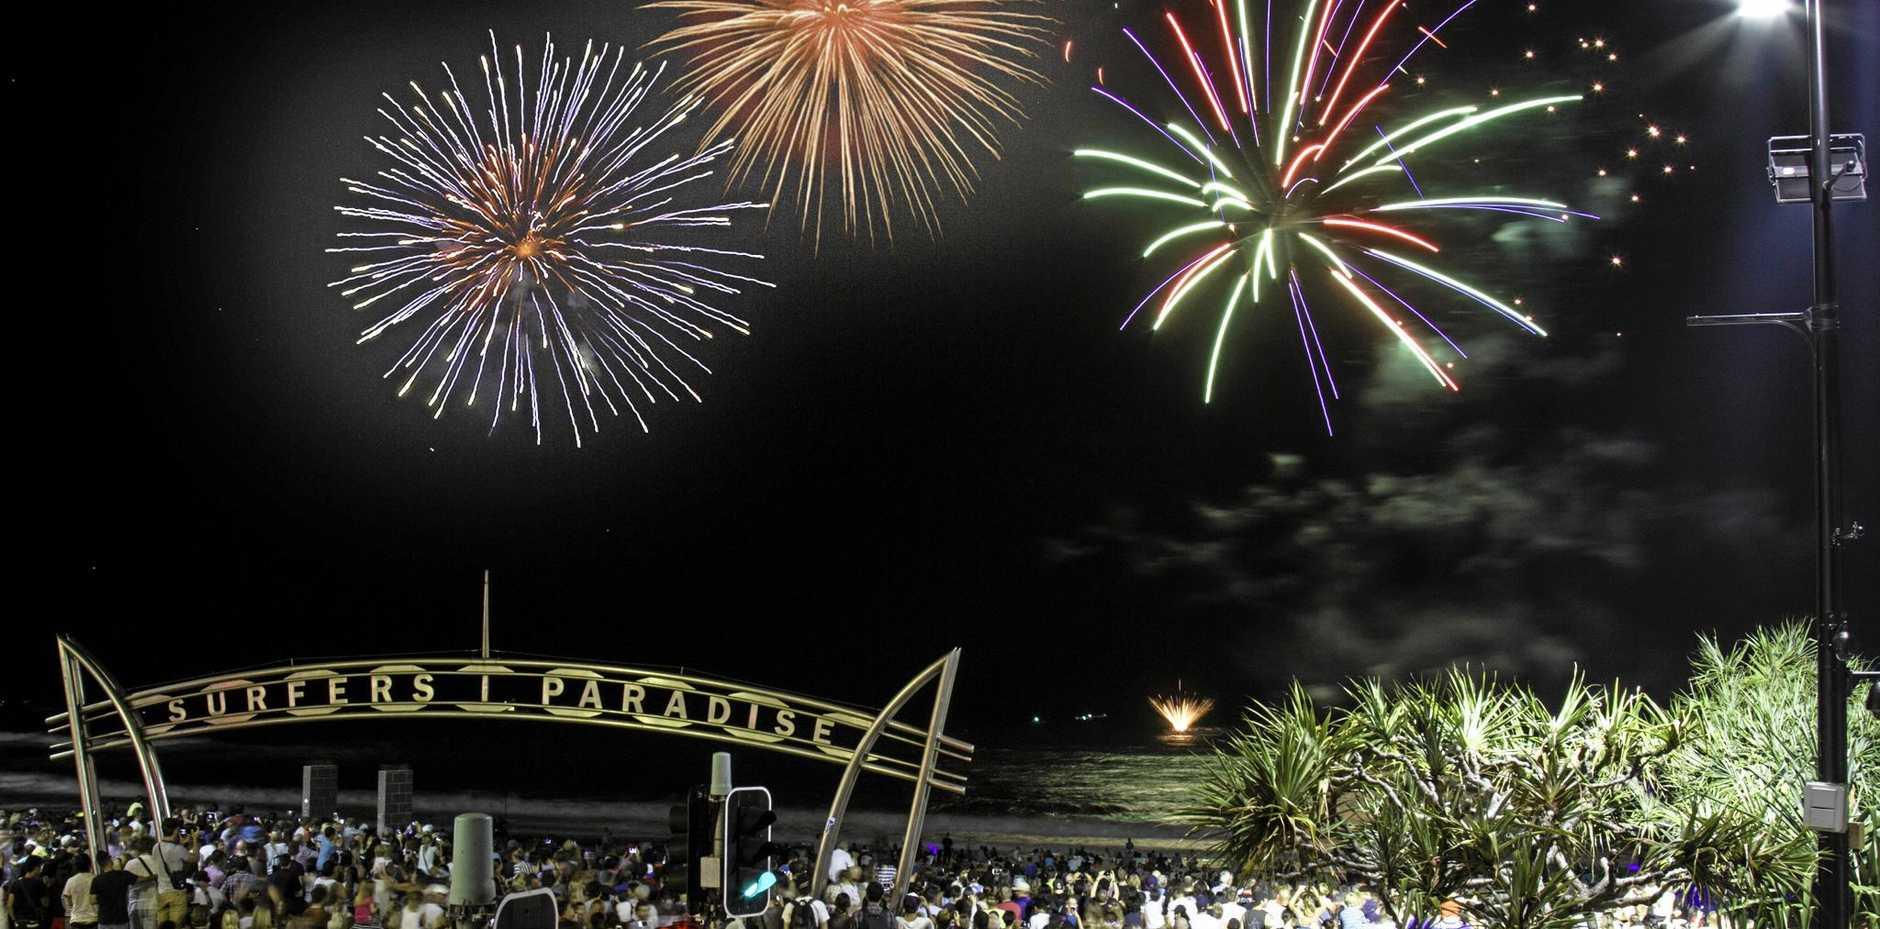 CELEBRATIONS: Fireworks on Surfers Paradise Beach.